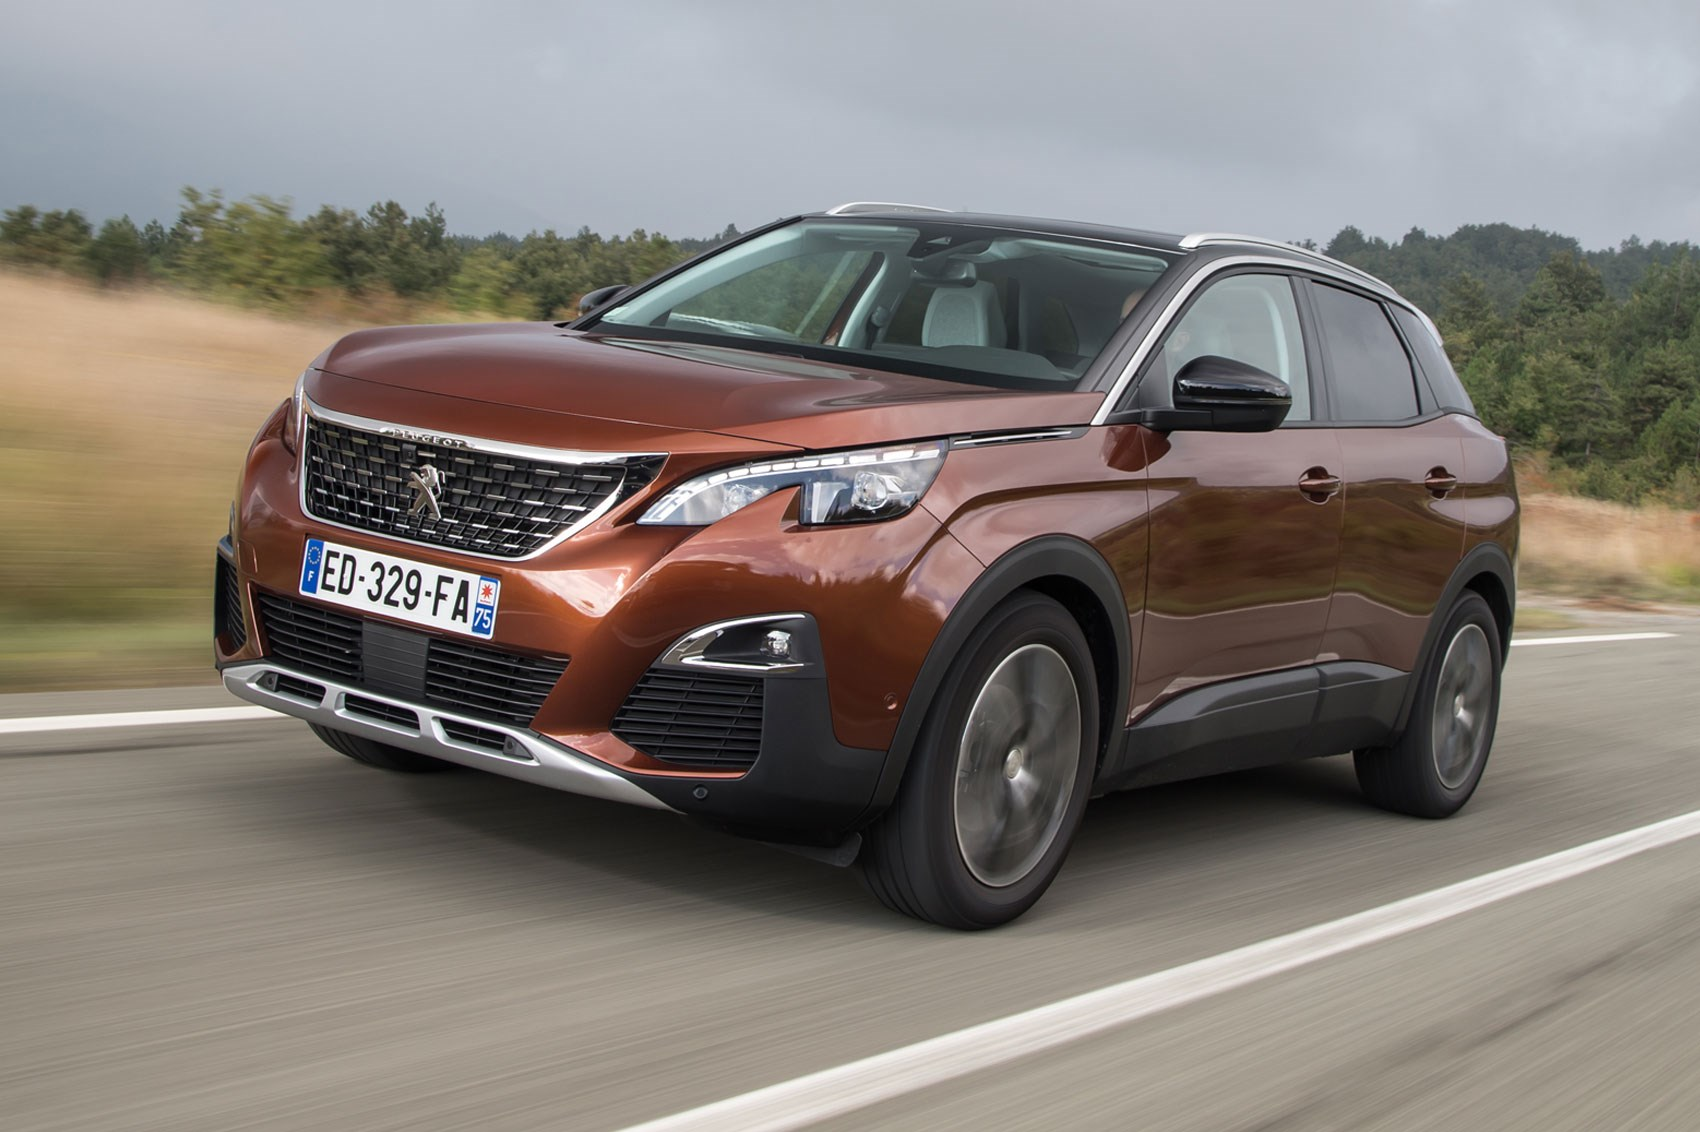 Satılık 2016 model Peugeot 3008